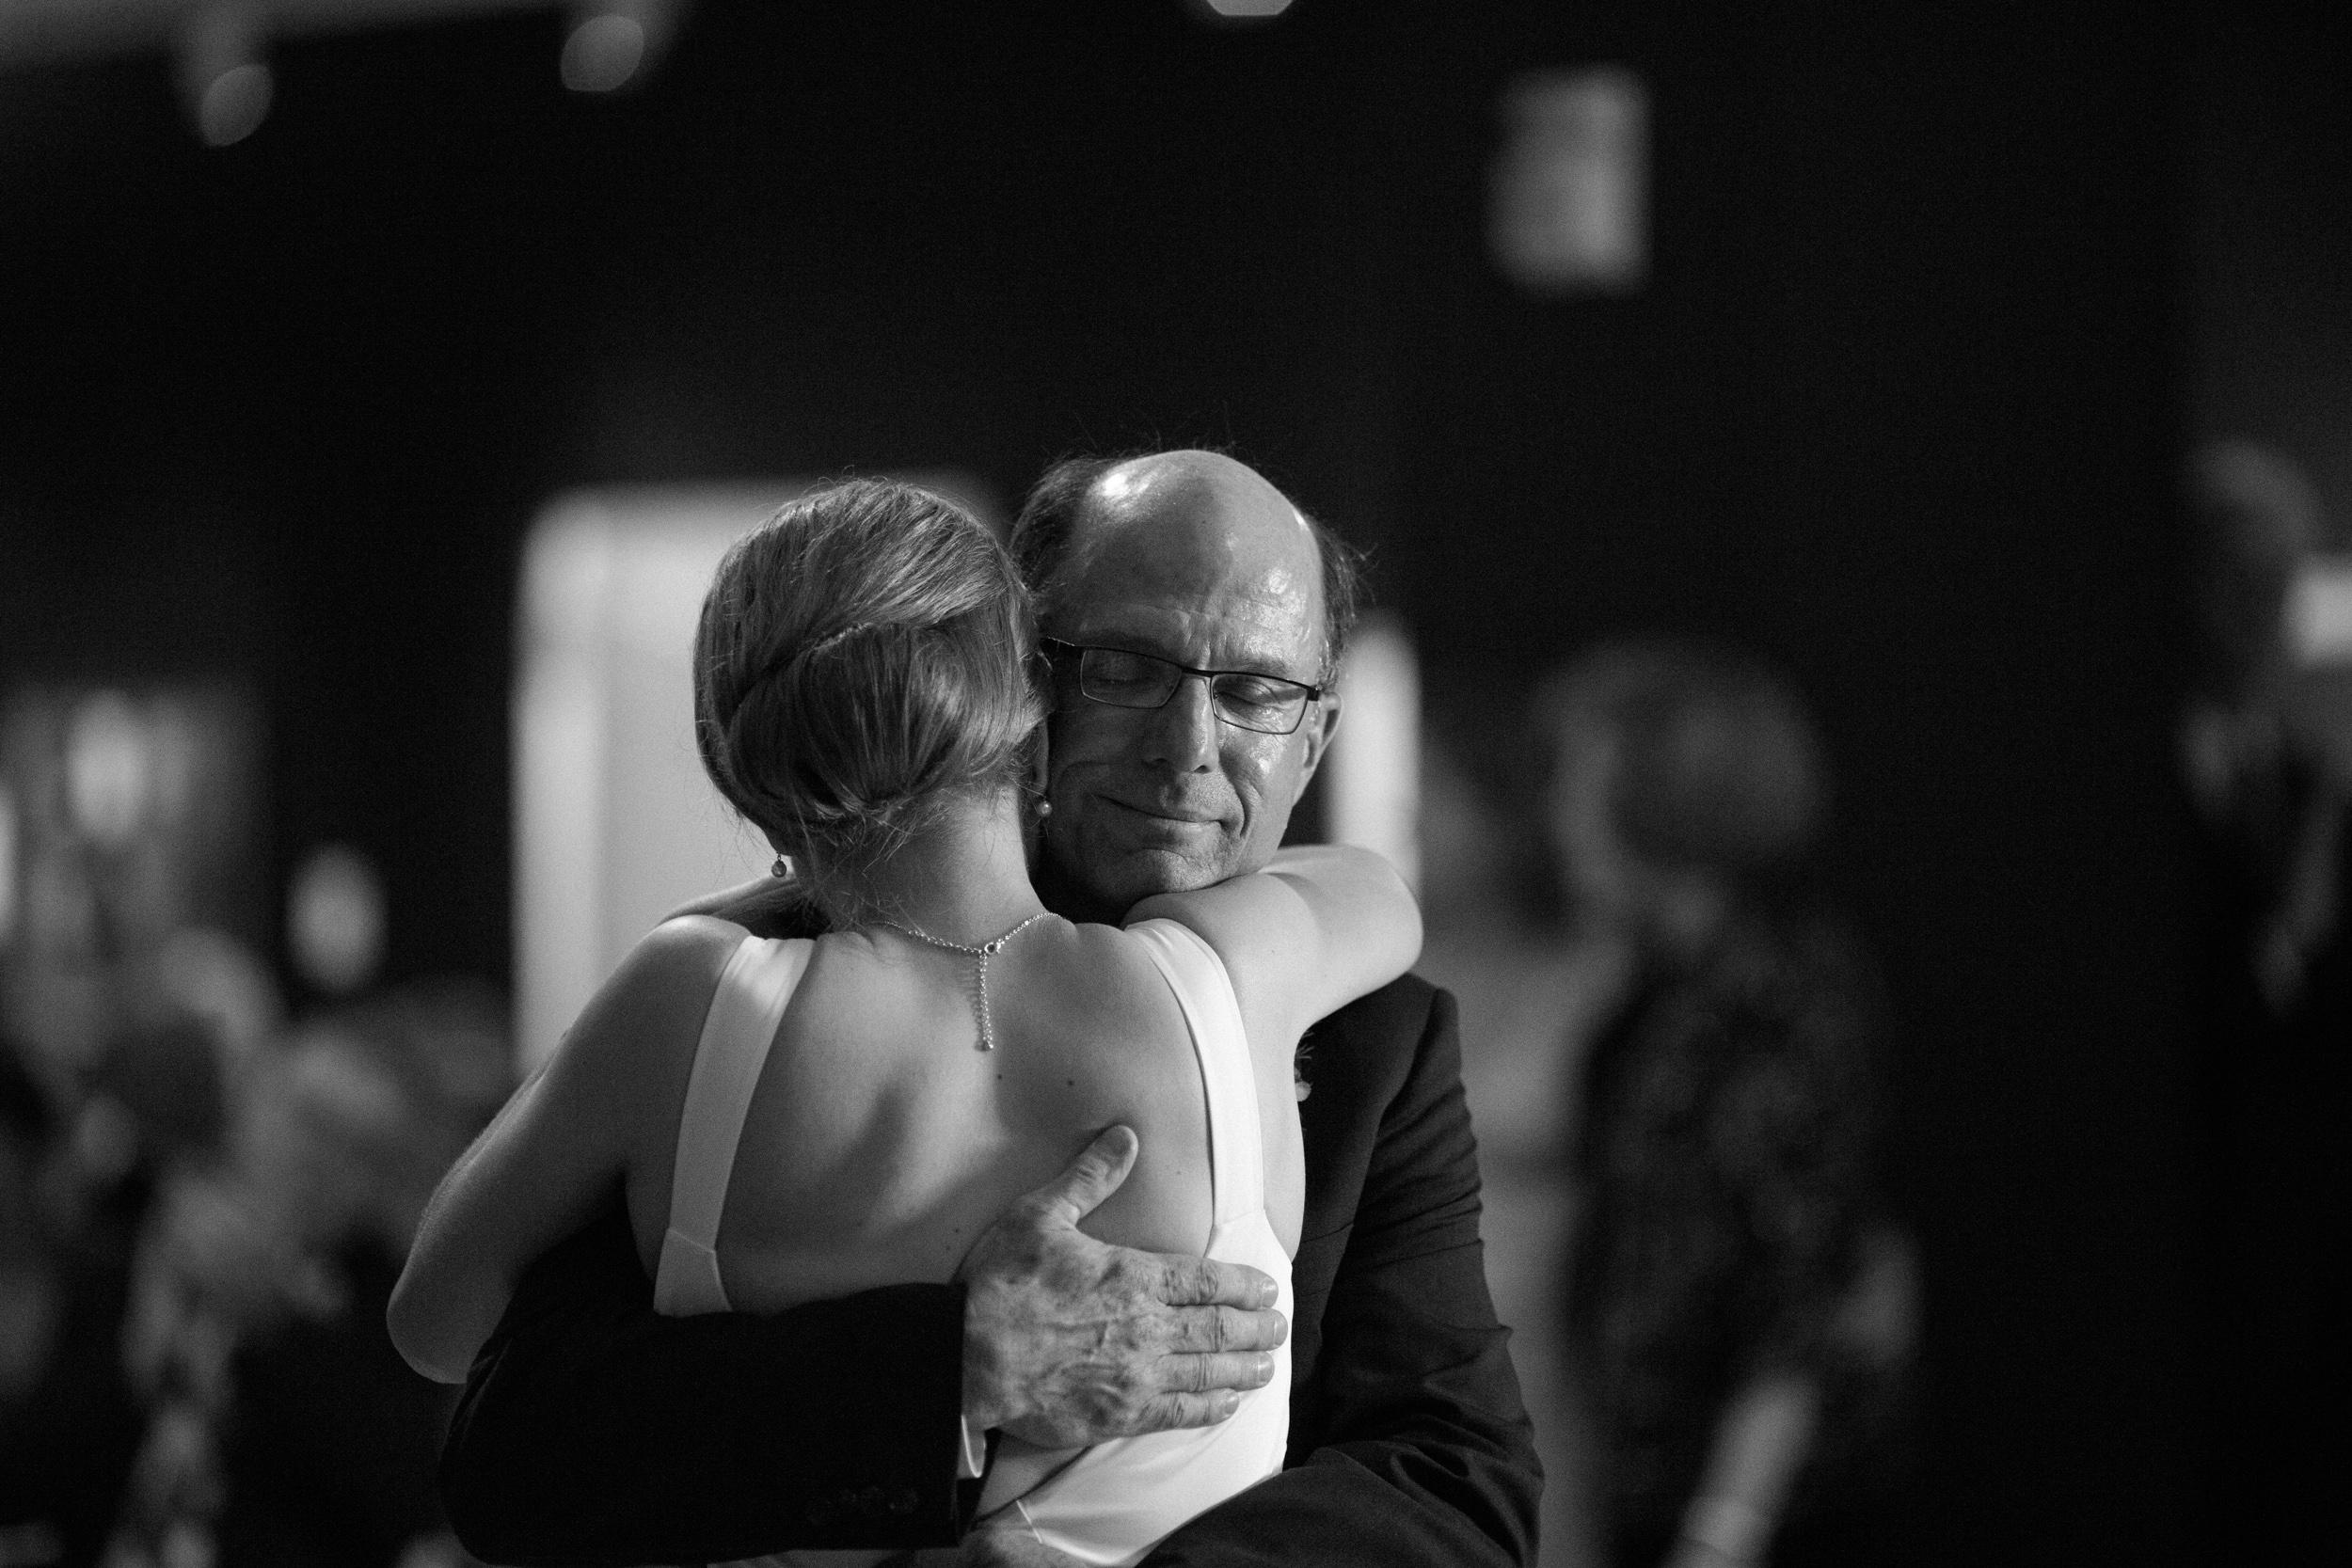 10-05-2013 maggie & adam wedding photography by brian milo-165.jpg